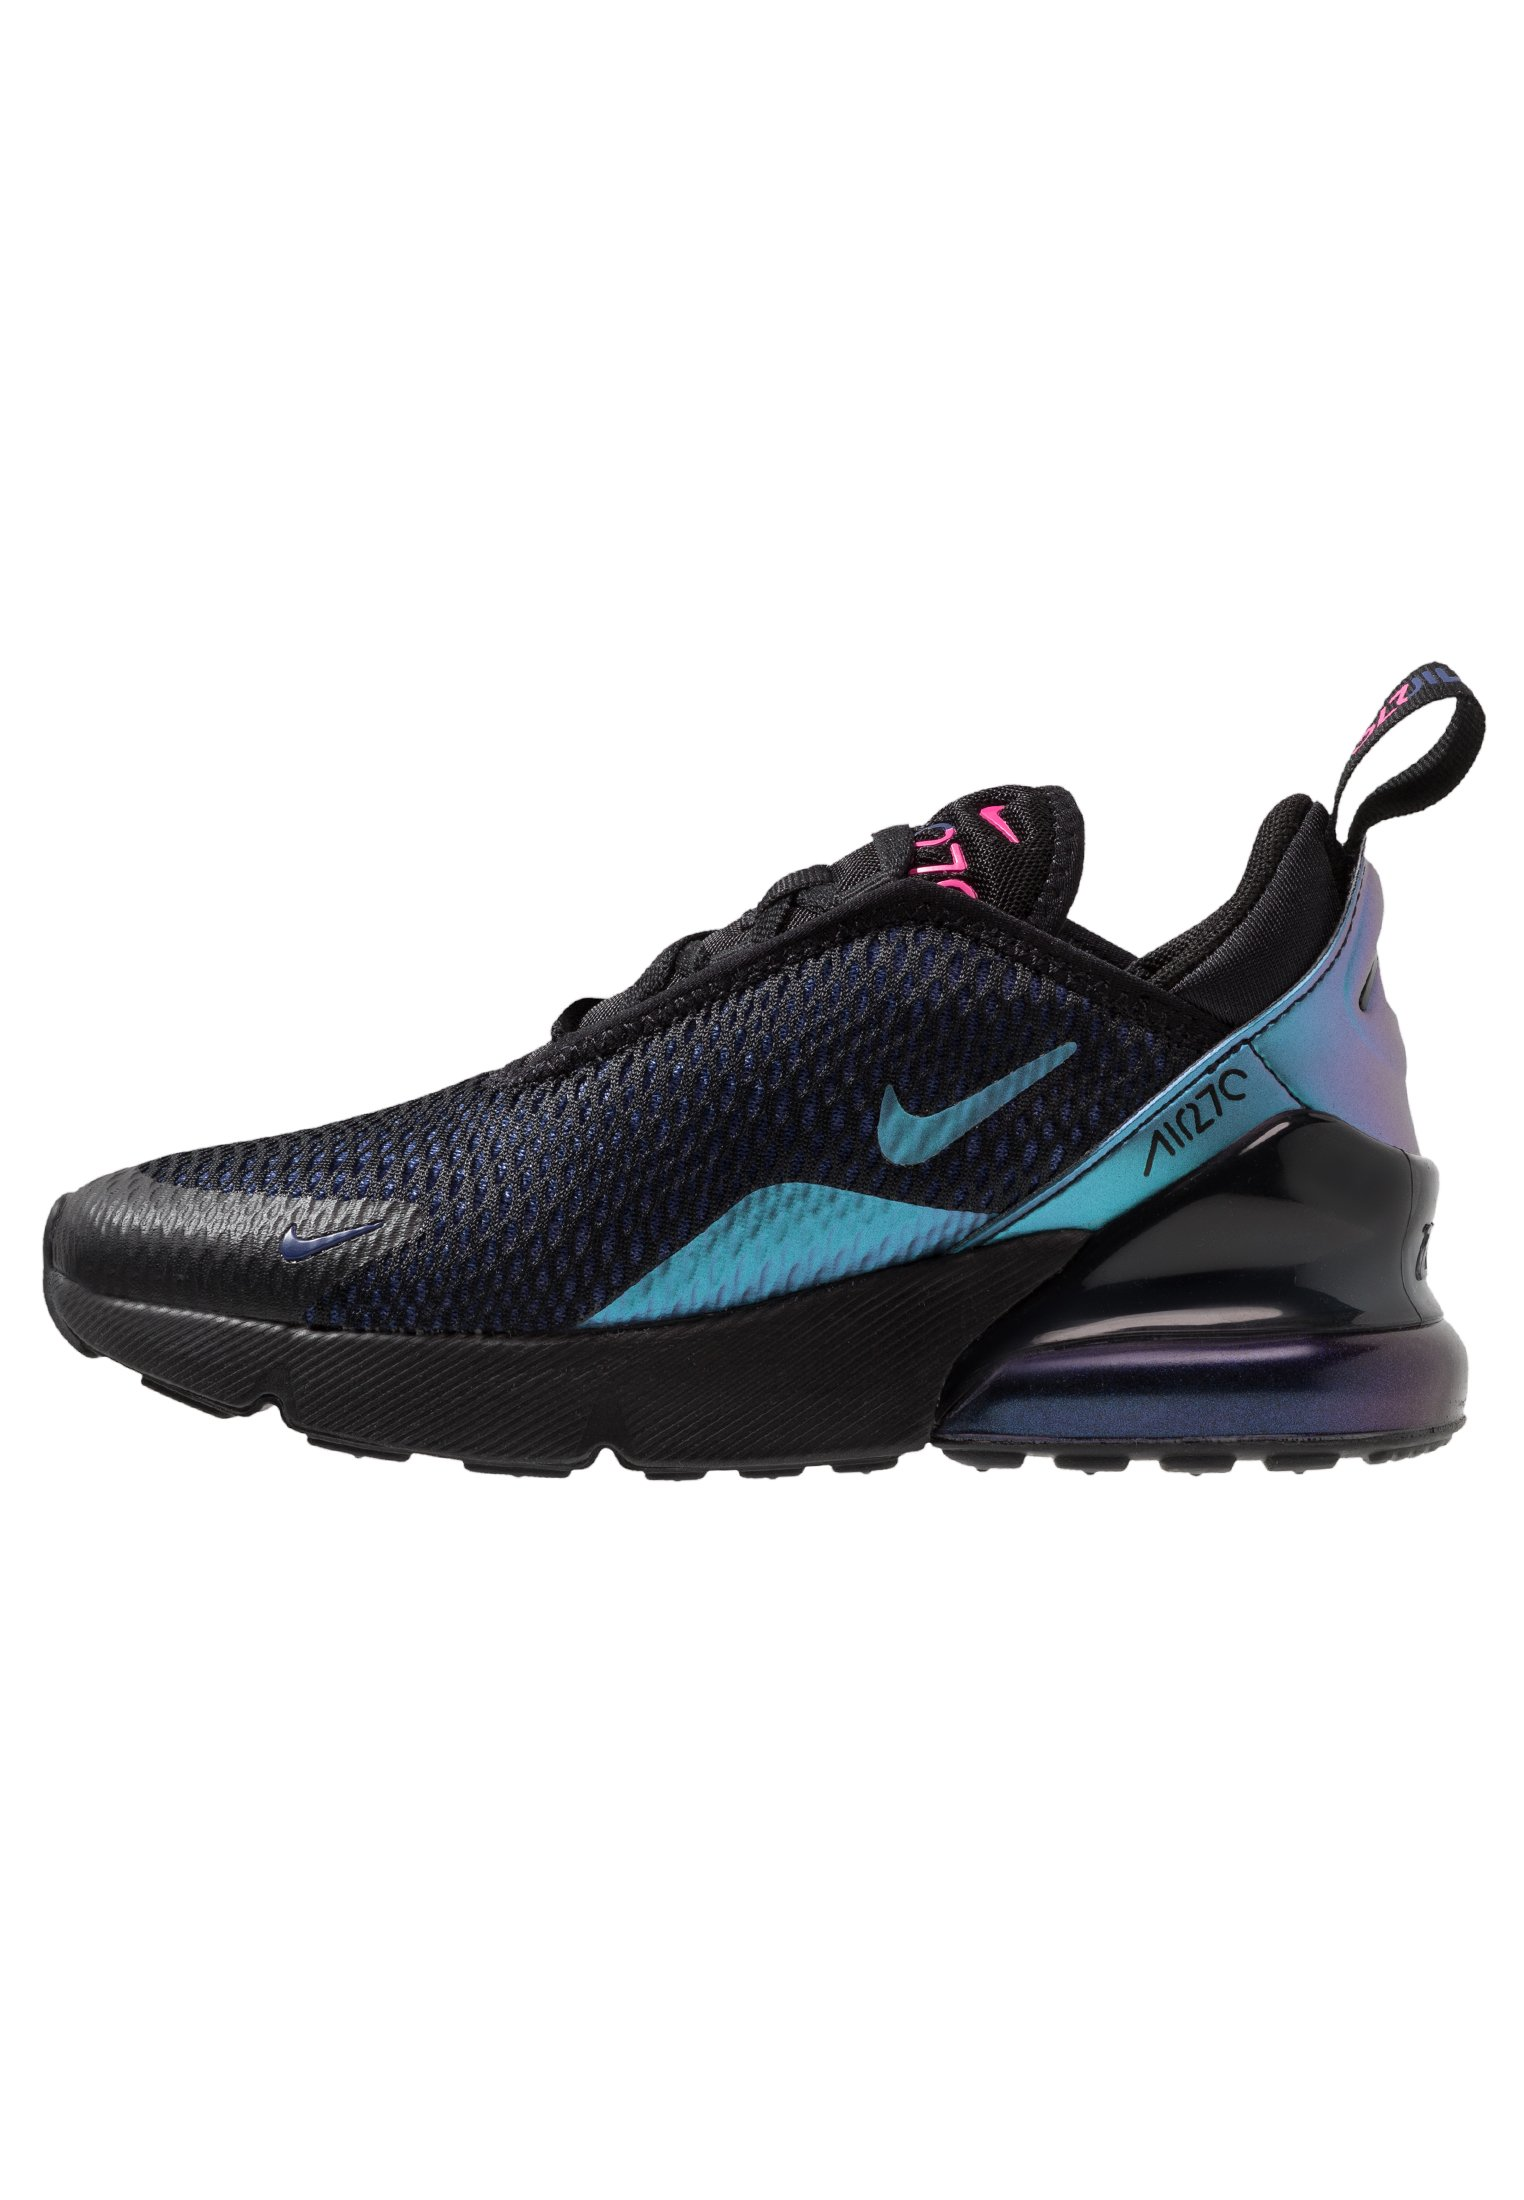 AIR MAX 270 Sneakers basse blacklaser fuchsiaregency purpleanthracite